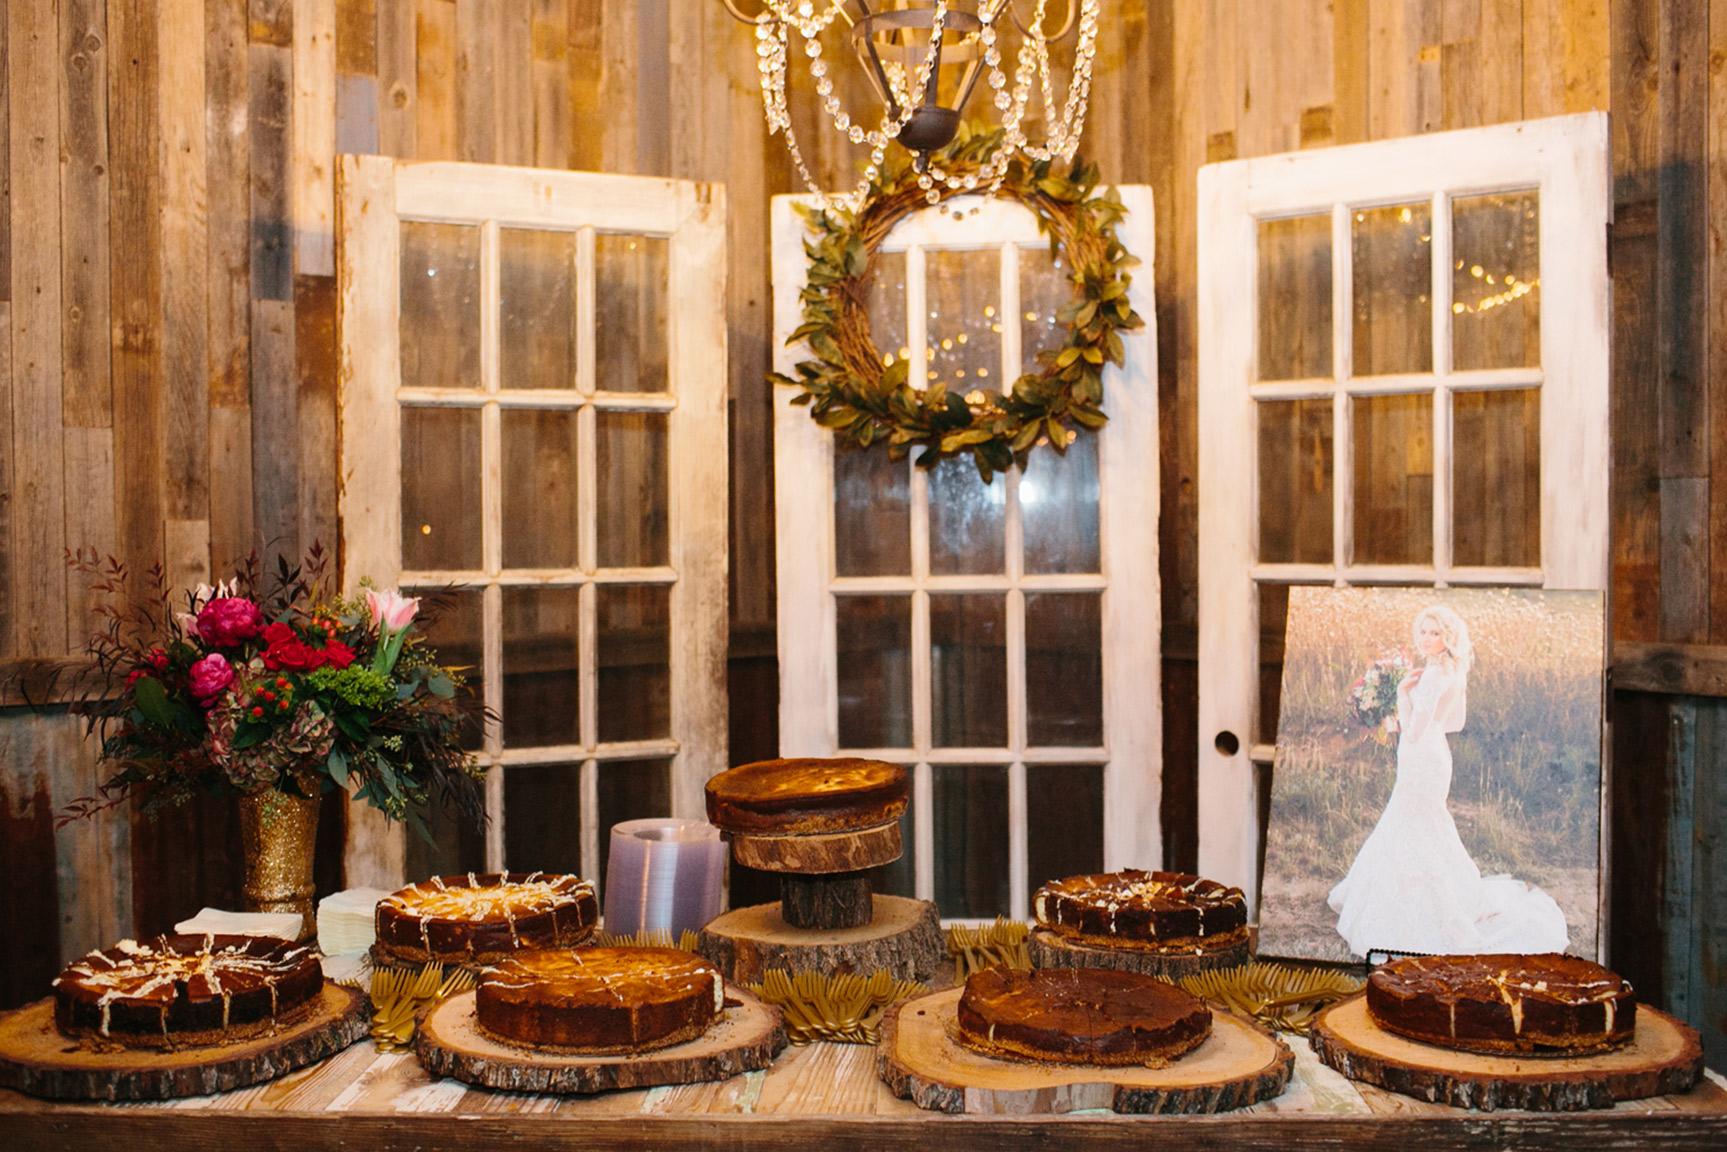 Cotton_Creek_Barn_Winter_Wedding_WeddingPhotographer053.jpg